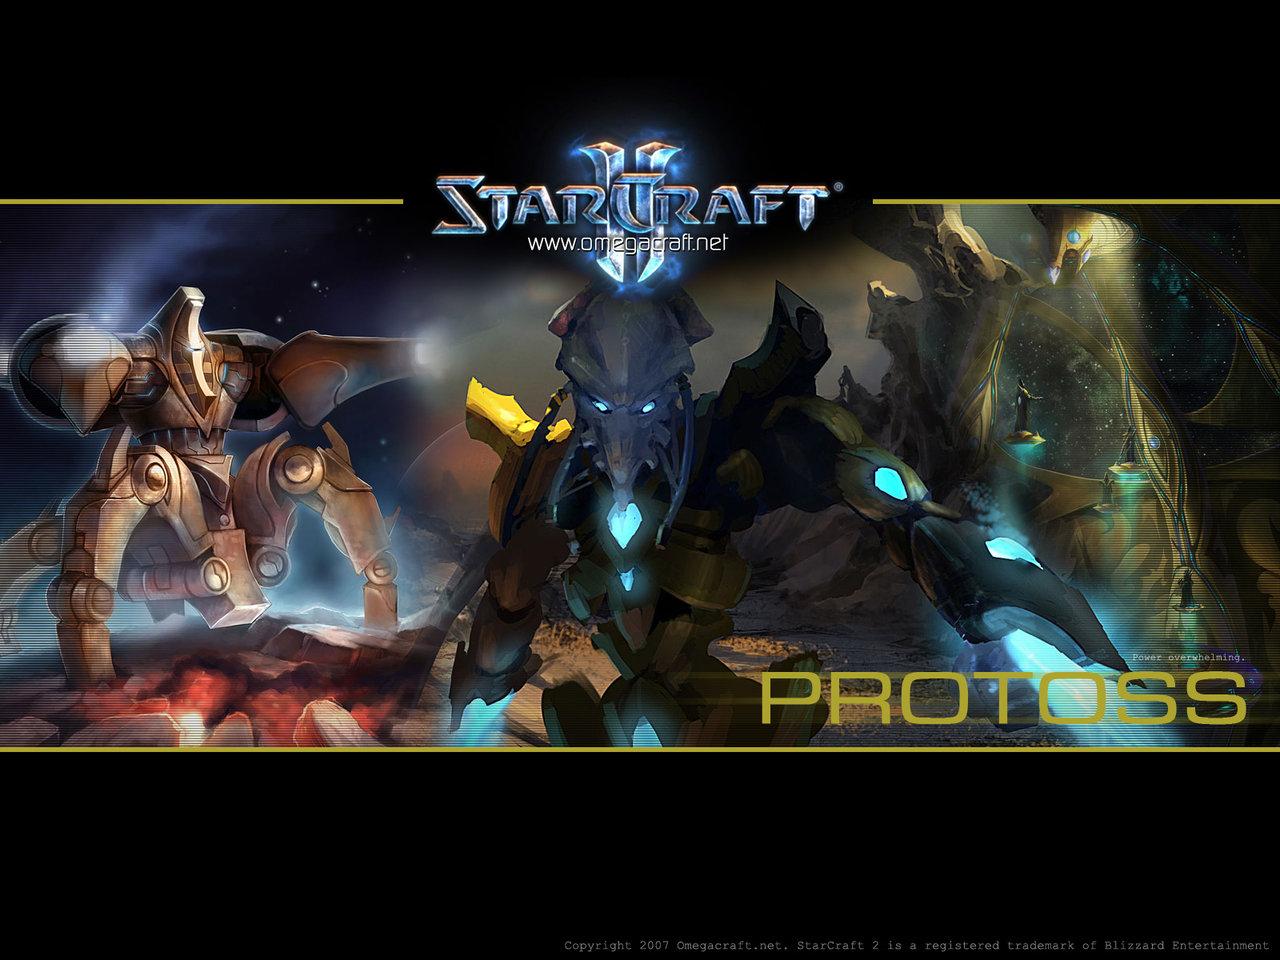 http://1.bp.blogspot.com/-MYvYQwBI2HU/TbDAW4YAhYI/AAAAAAAABVo/NHN_Ov-FoUg/s1600/StarCraft_2_Protoss_Wallpaper_by_maul.jpg